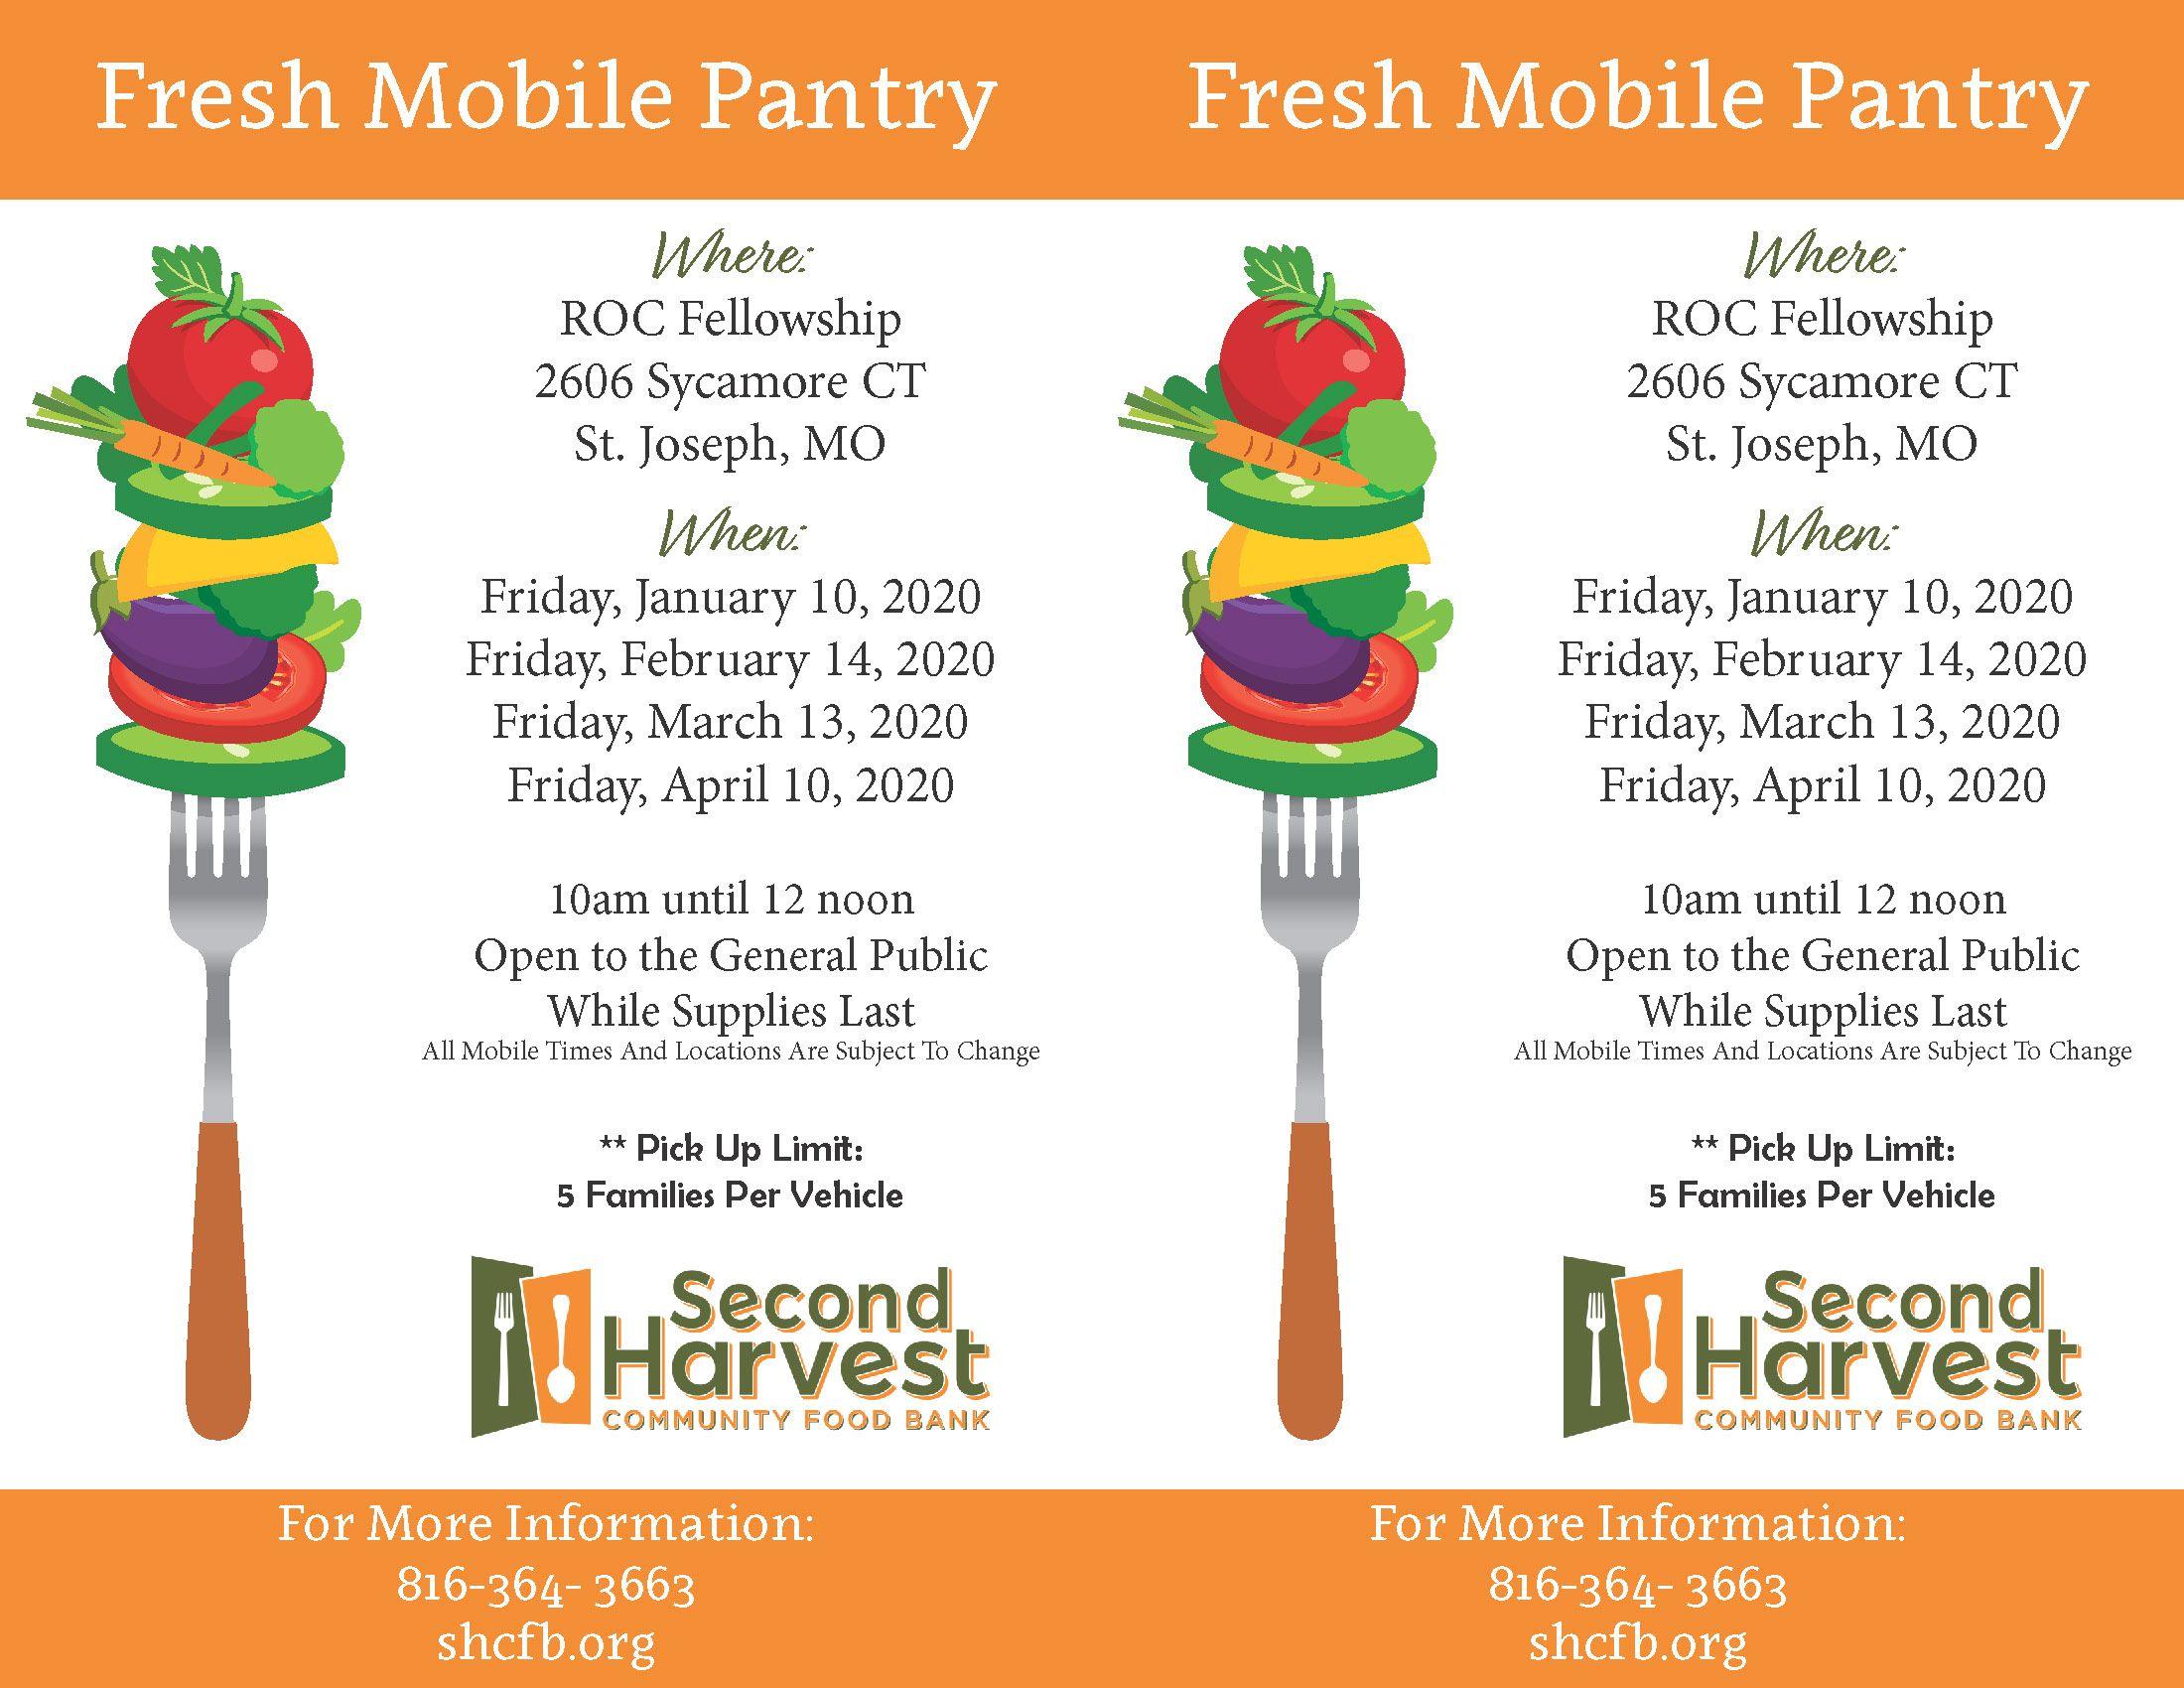 ROC Fellowship Fresh Mobile Pantry